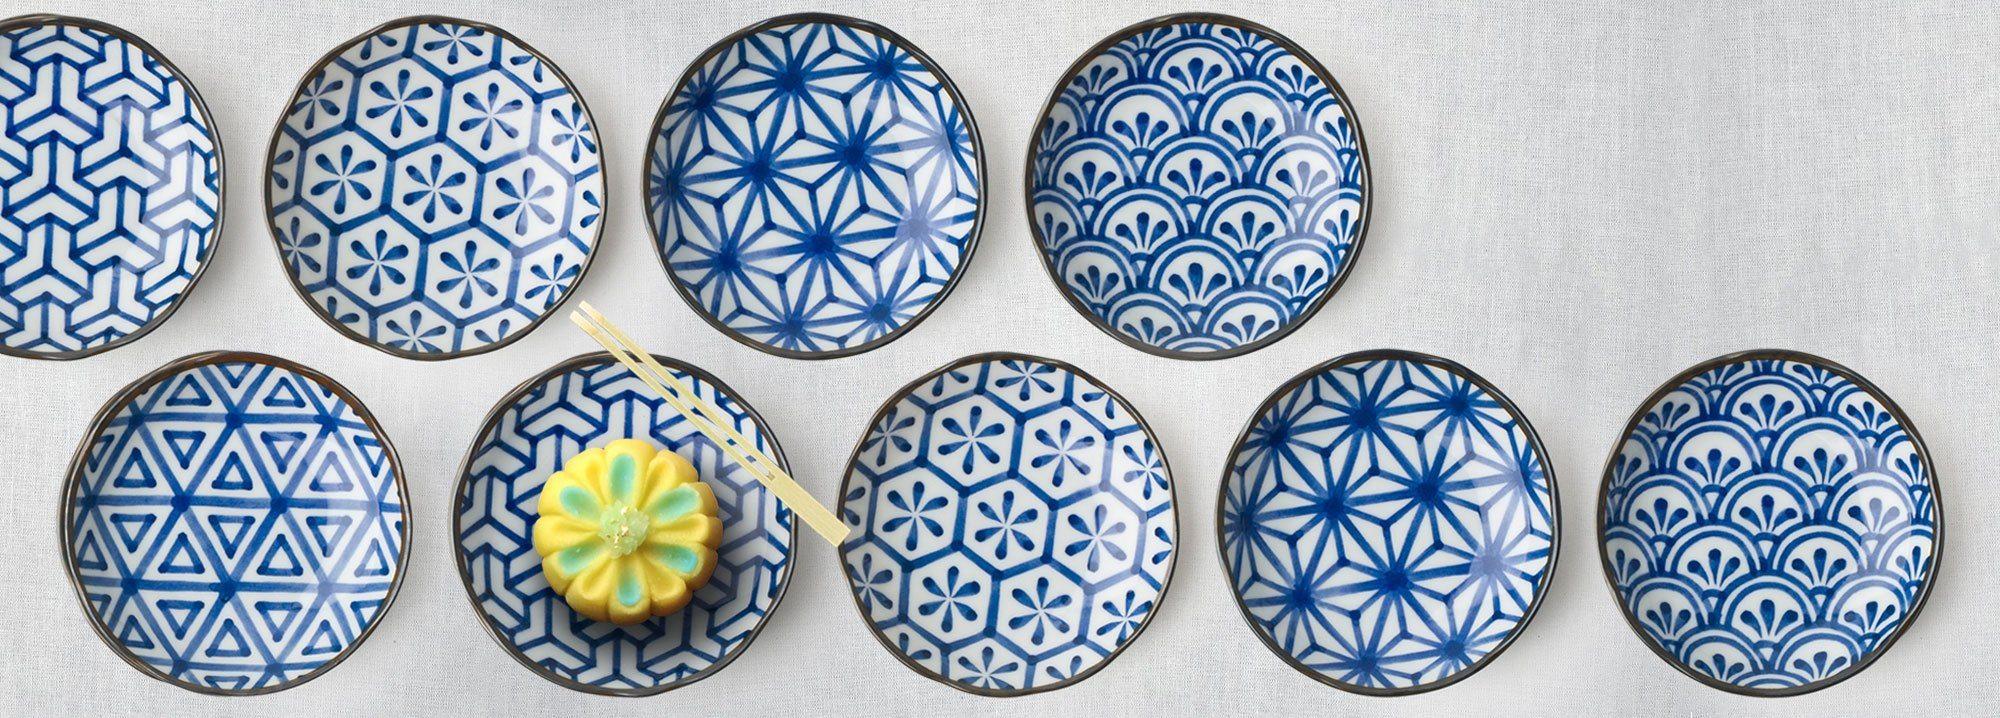 Miya Company - Monyou Blue & White Patterns